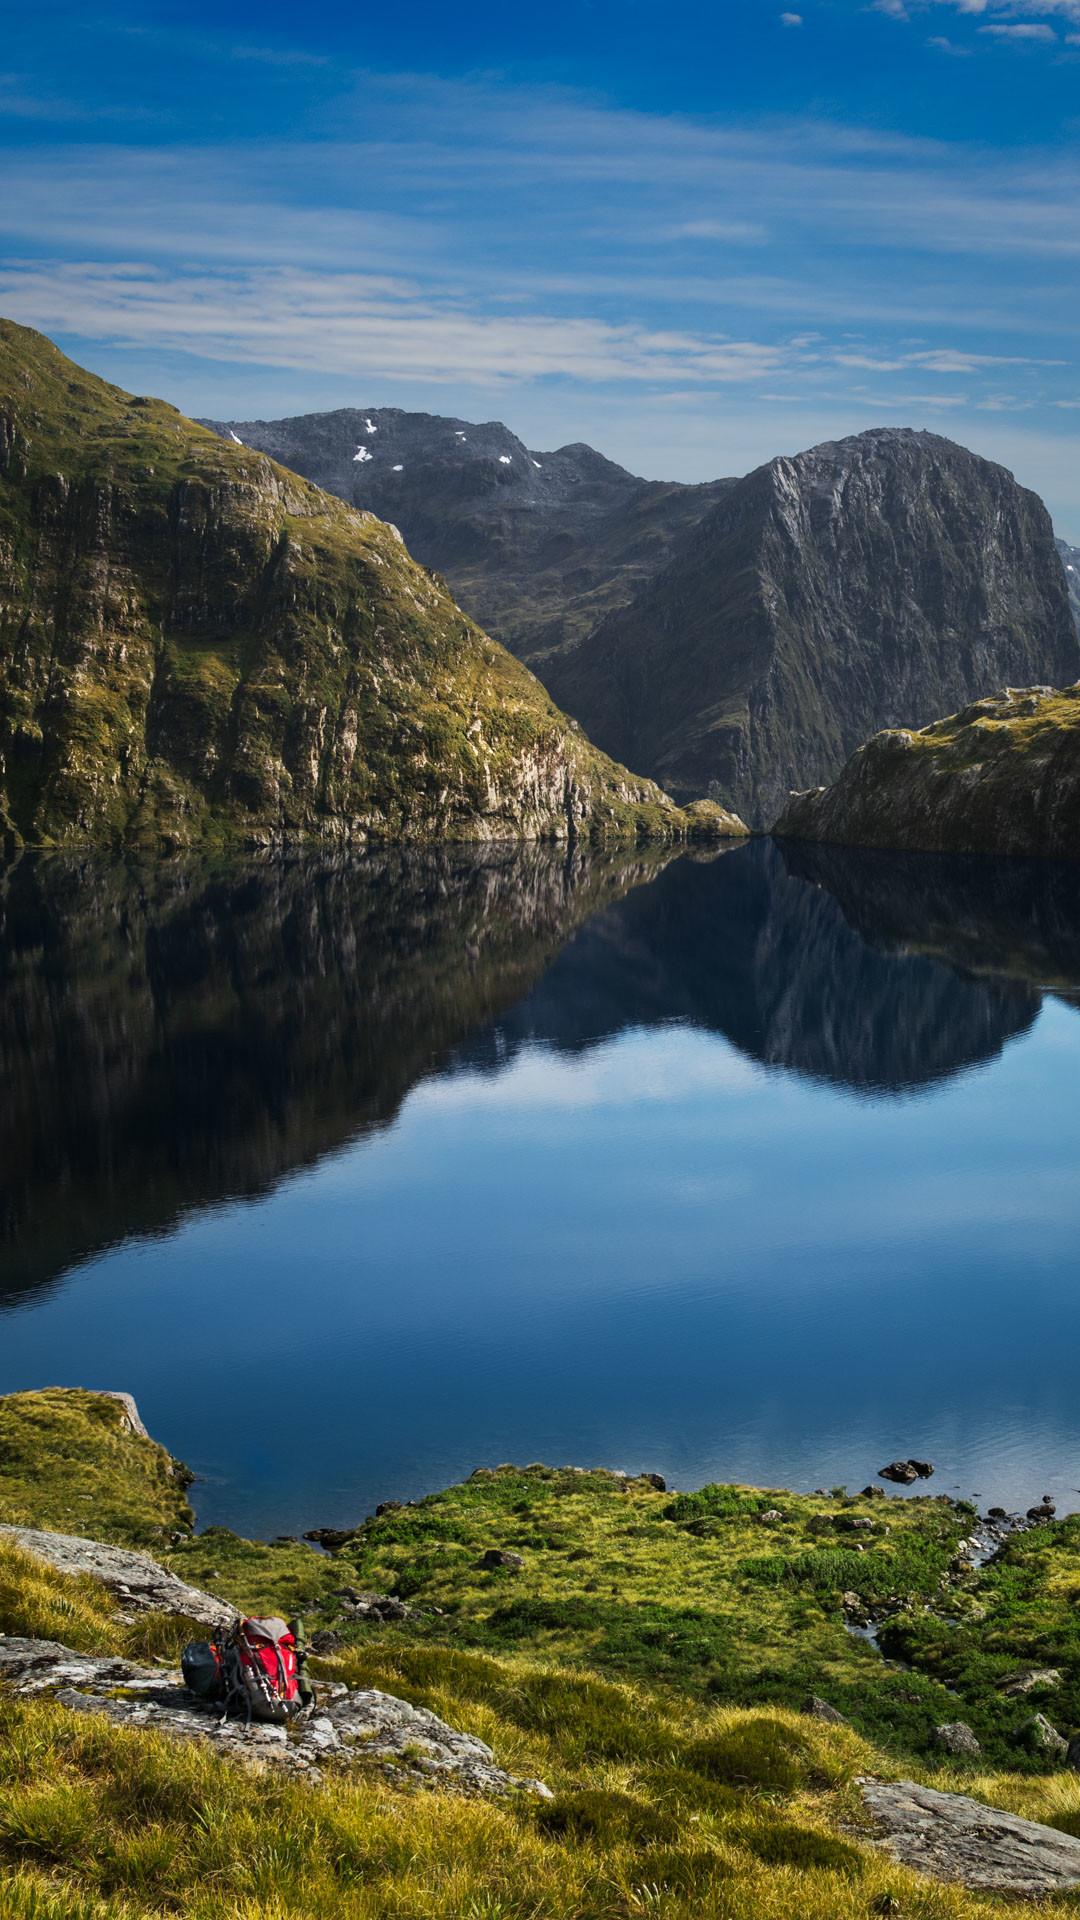 Top Wallpaper Mountain Google Nexus - img6  Gallery_98288.jpg